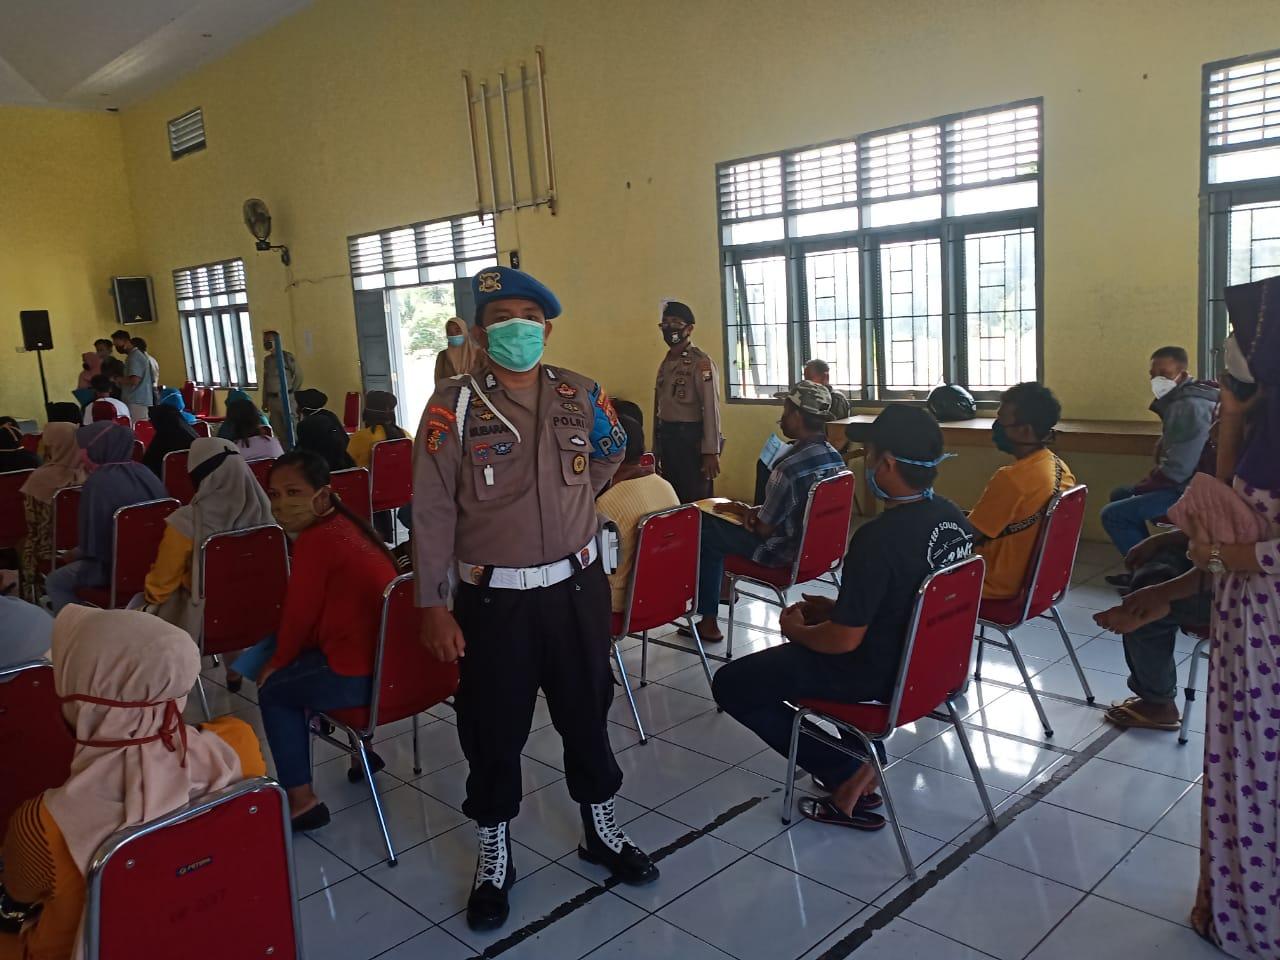 Kapolres Soppeng Instruksikan Kapolsek Jajaran Laksanakan Pengamanan Penyaluran BST